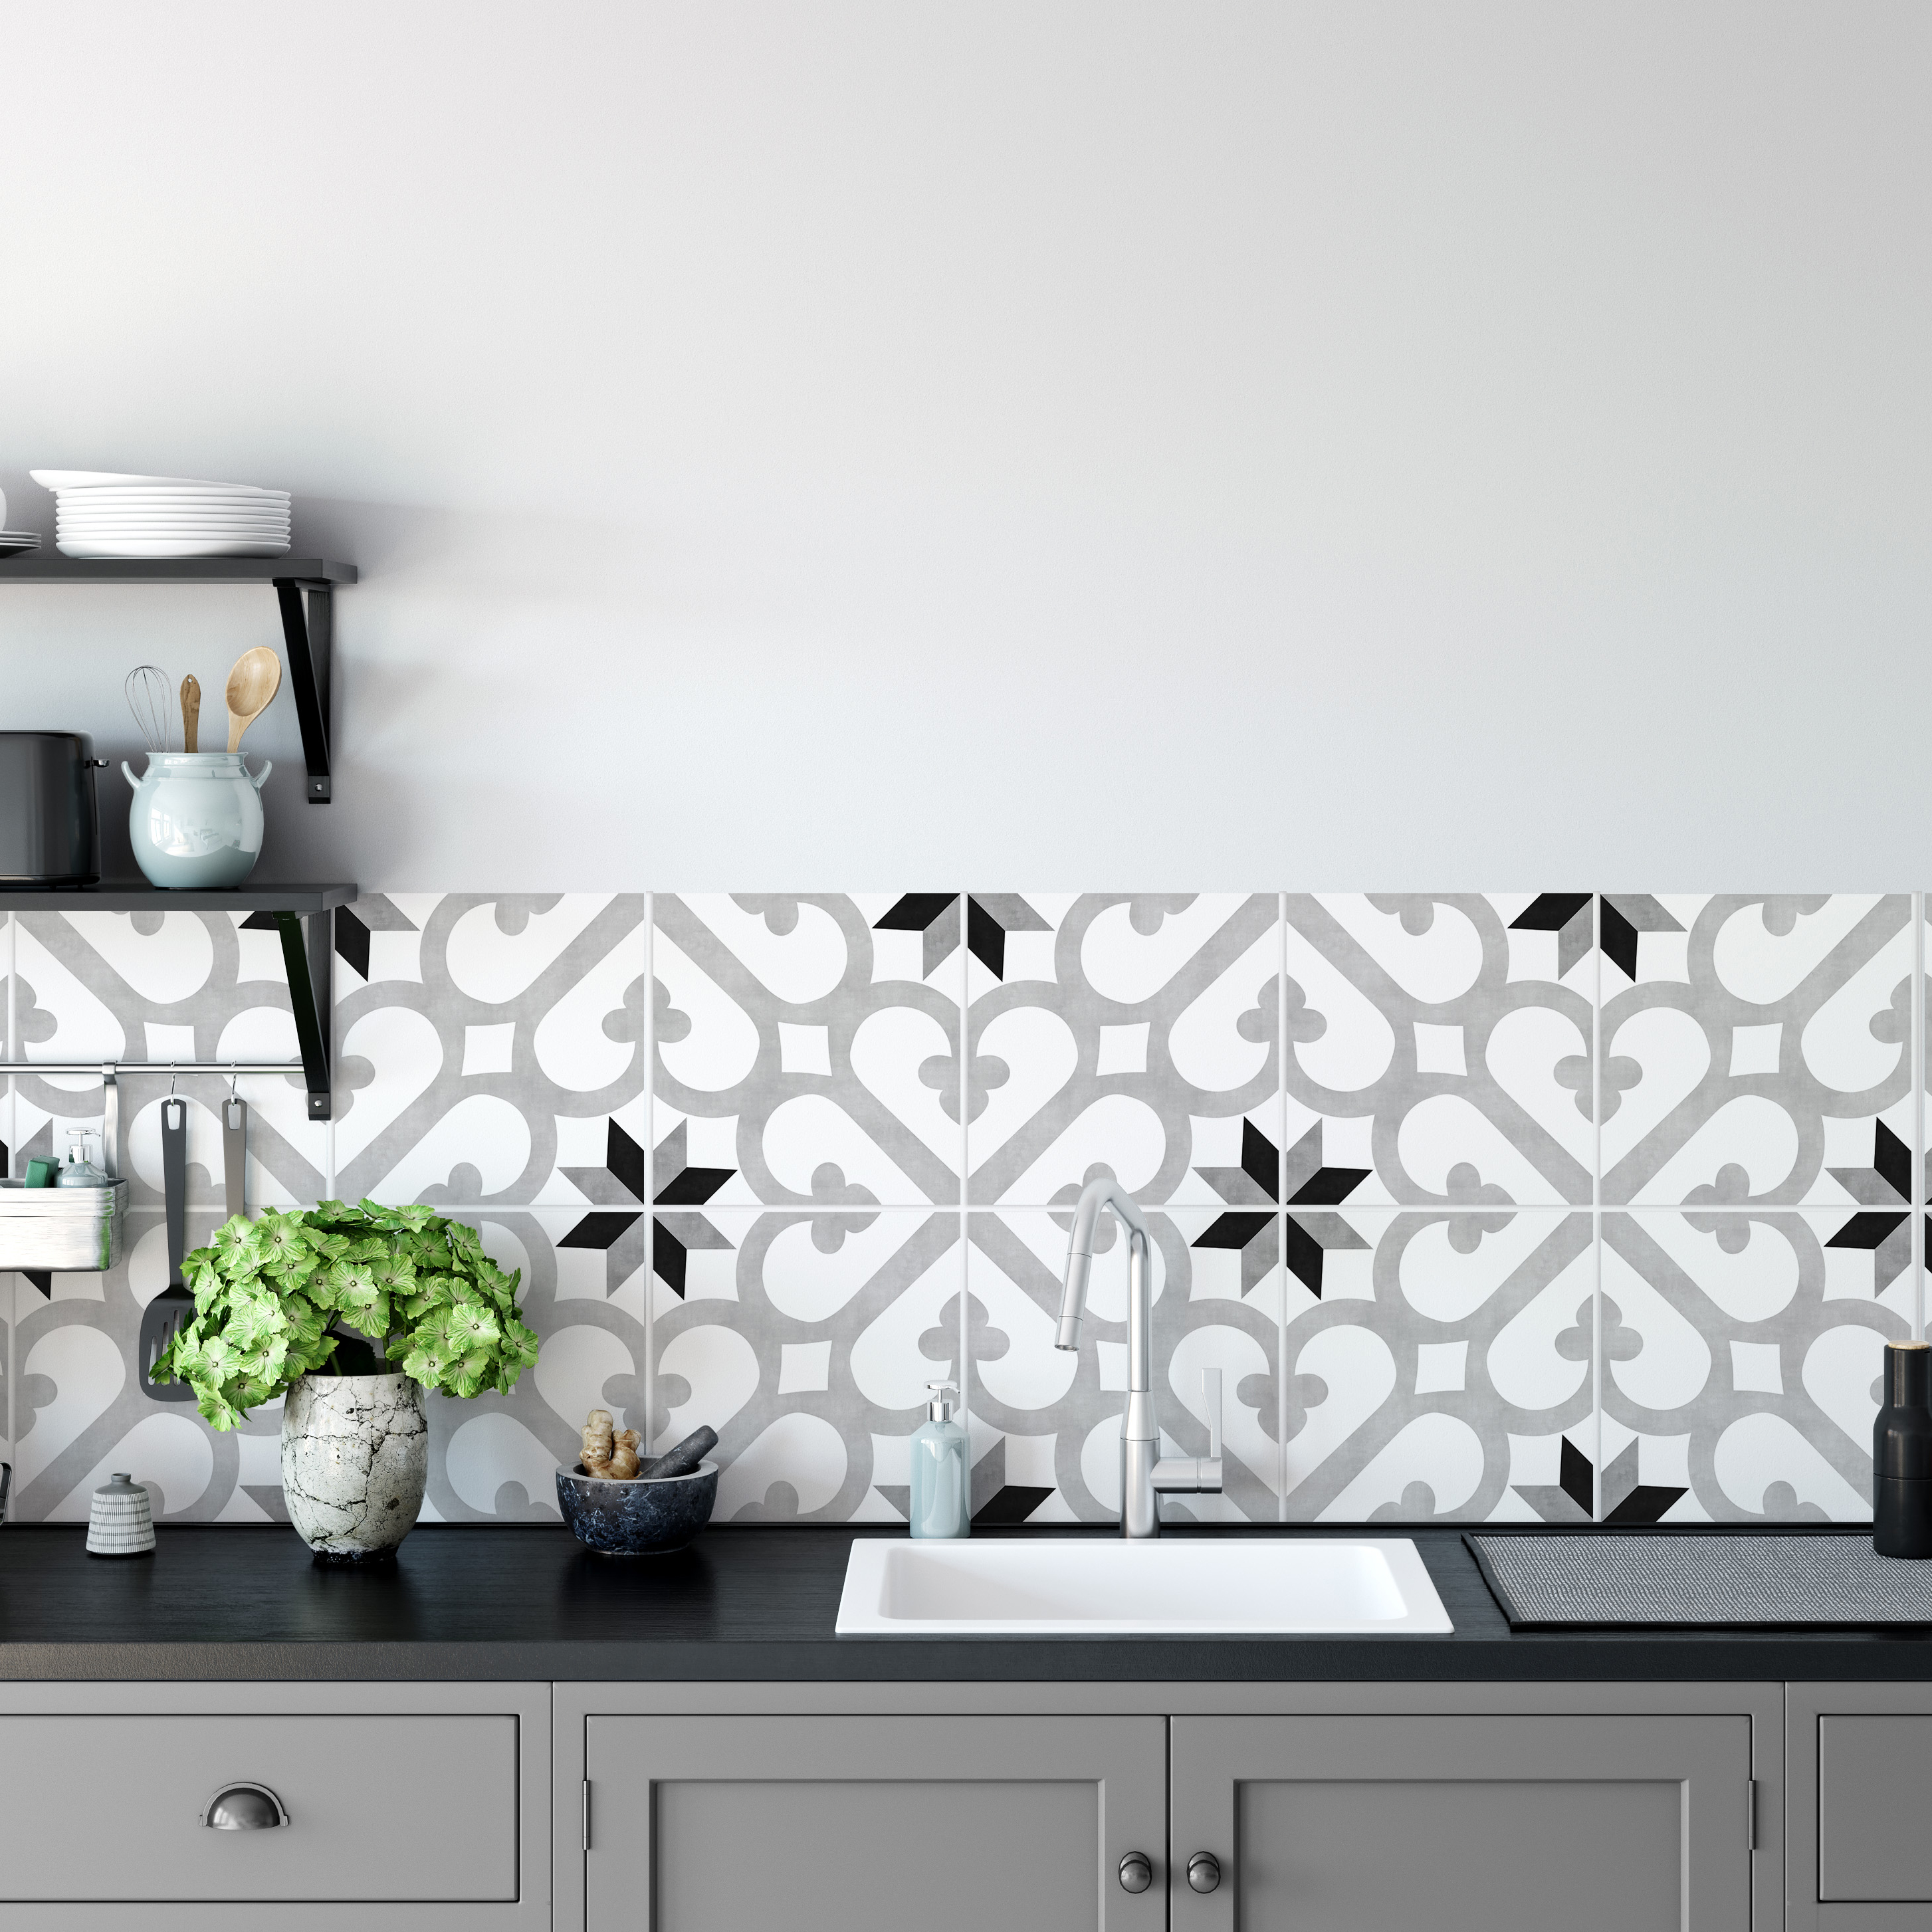 Kitchen Backsplash Decor Diana Tile Stickers Moonwallstickers Com